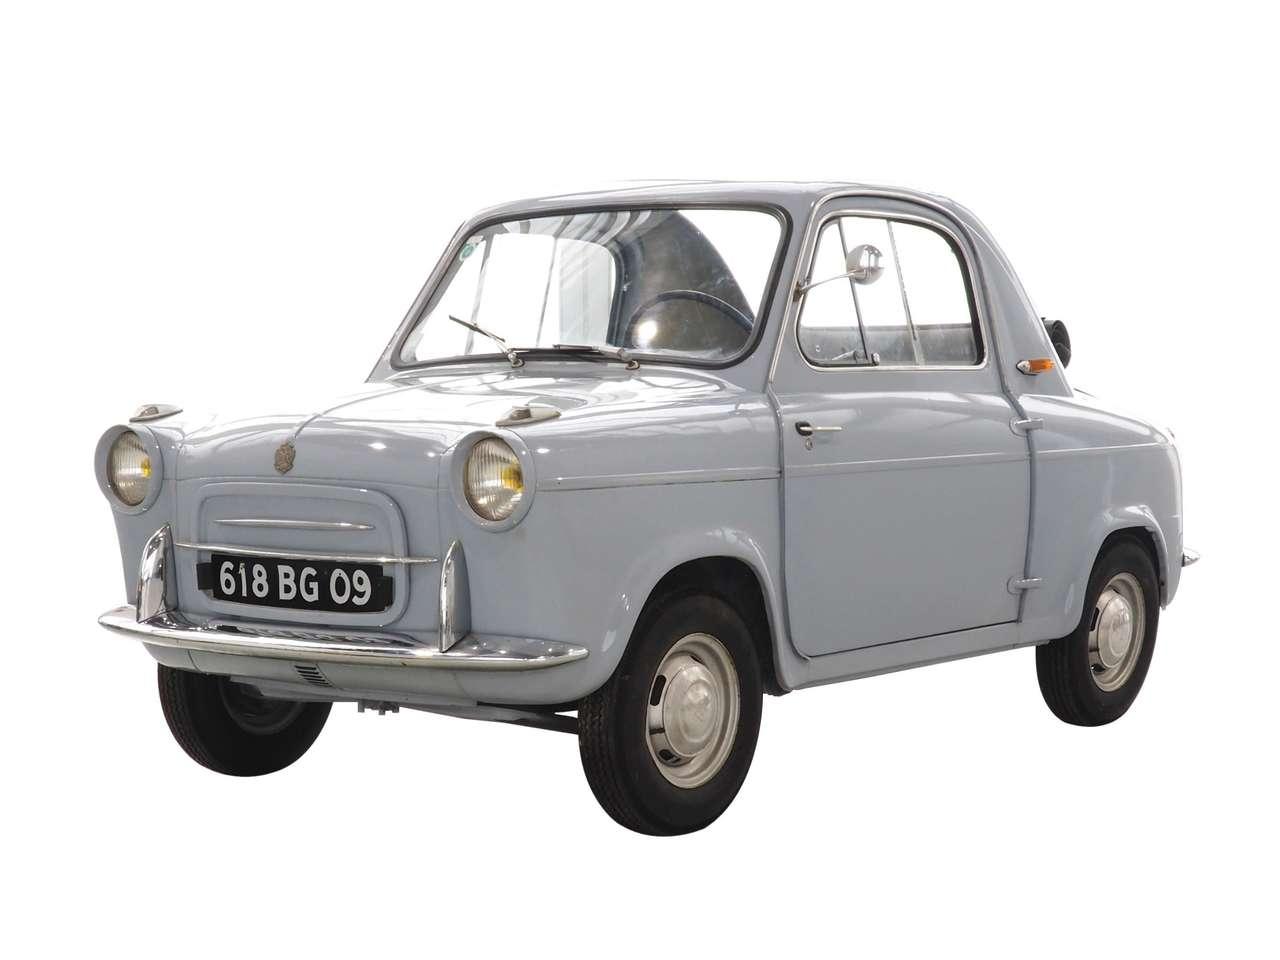 Vespa 400 aus dem Jahr 1960